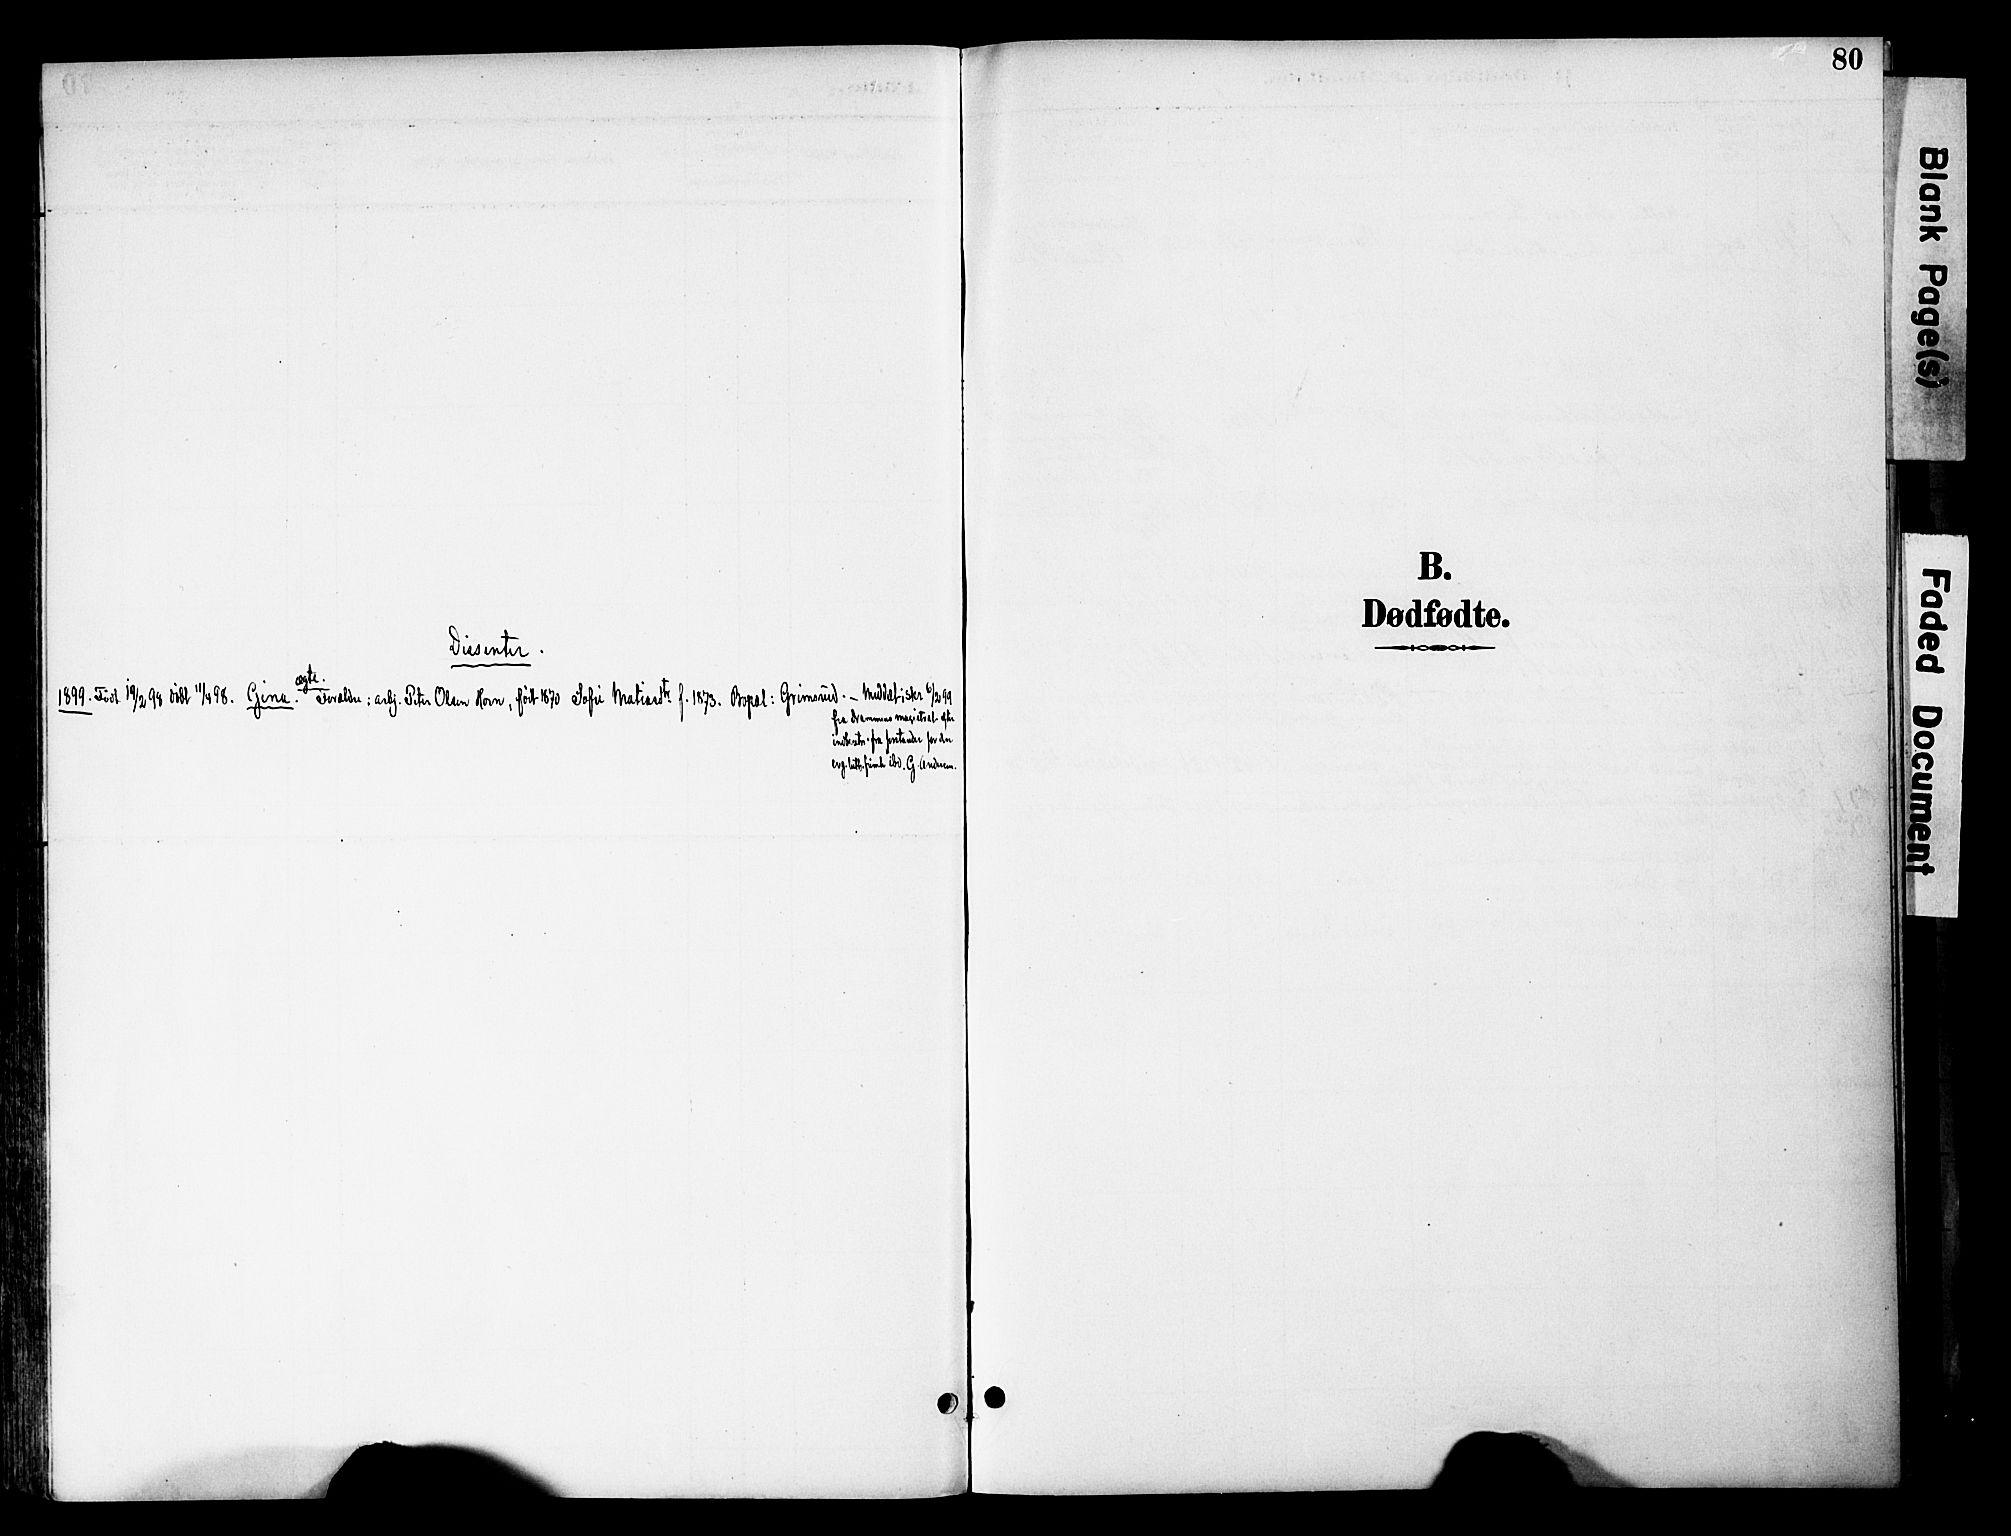 SAH, Gran prestekontor, Ministerialbok nr. 20, 1889-1899, s. 80